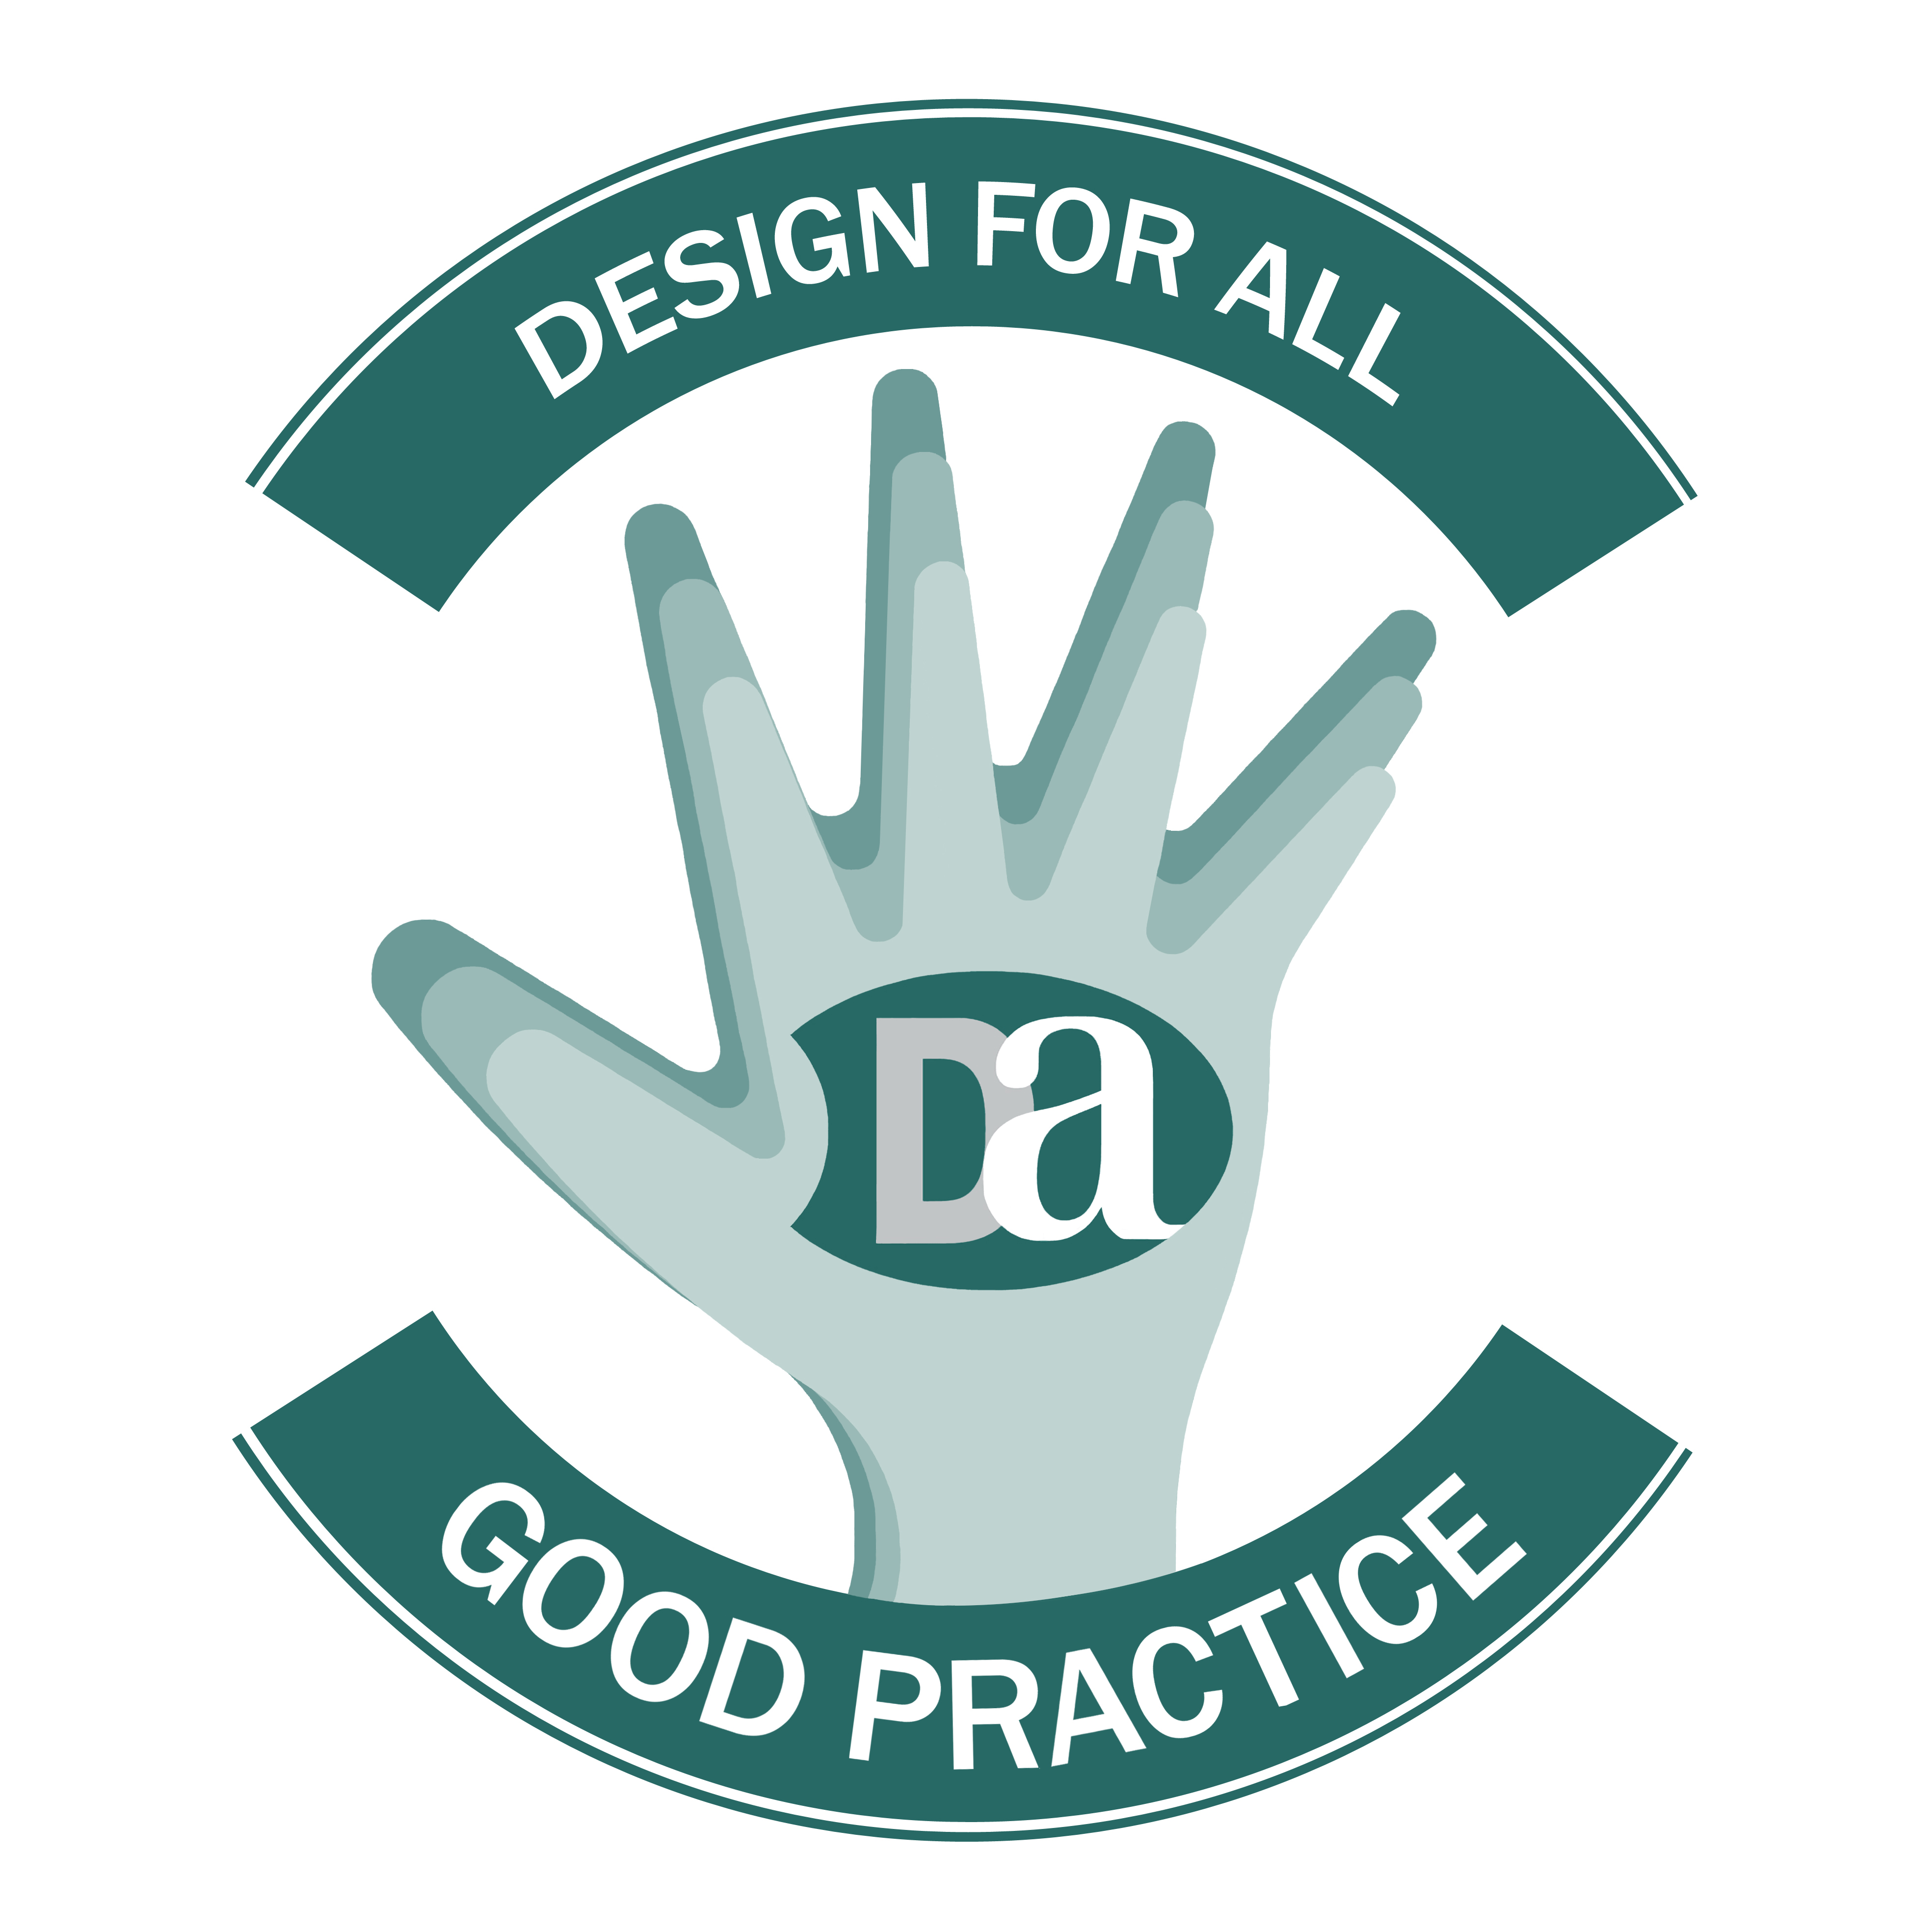 Good_Practice_logo